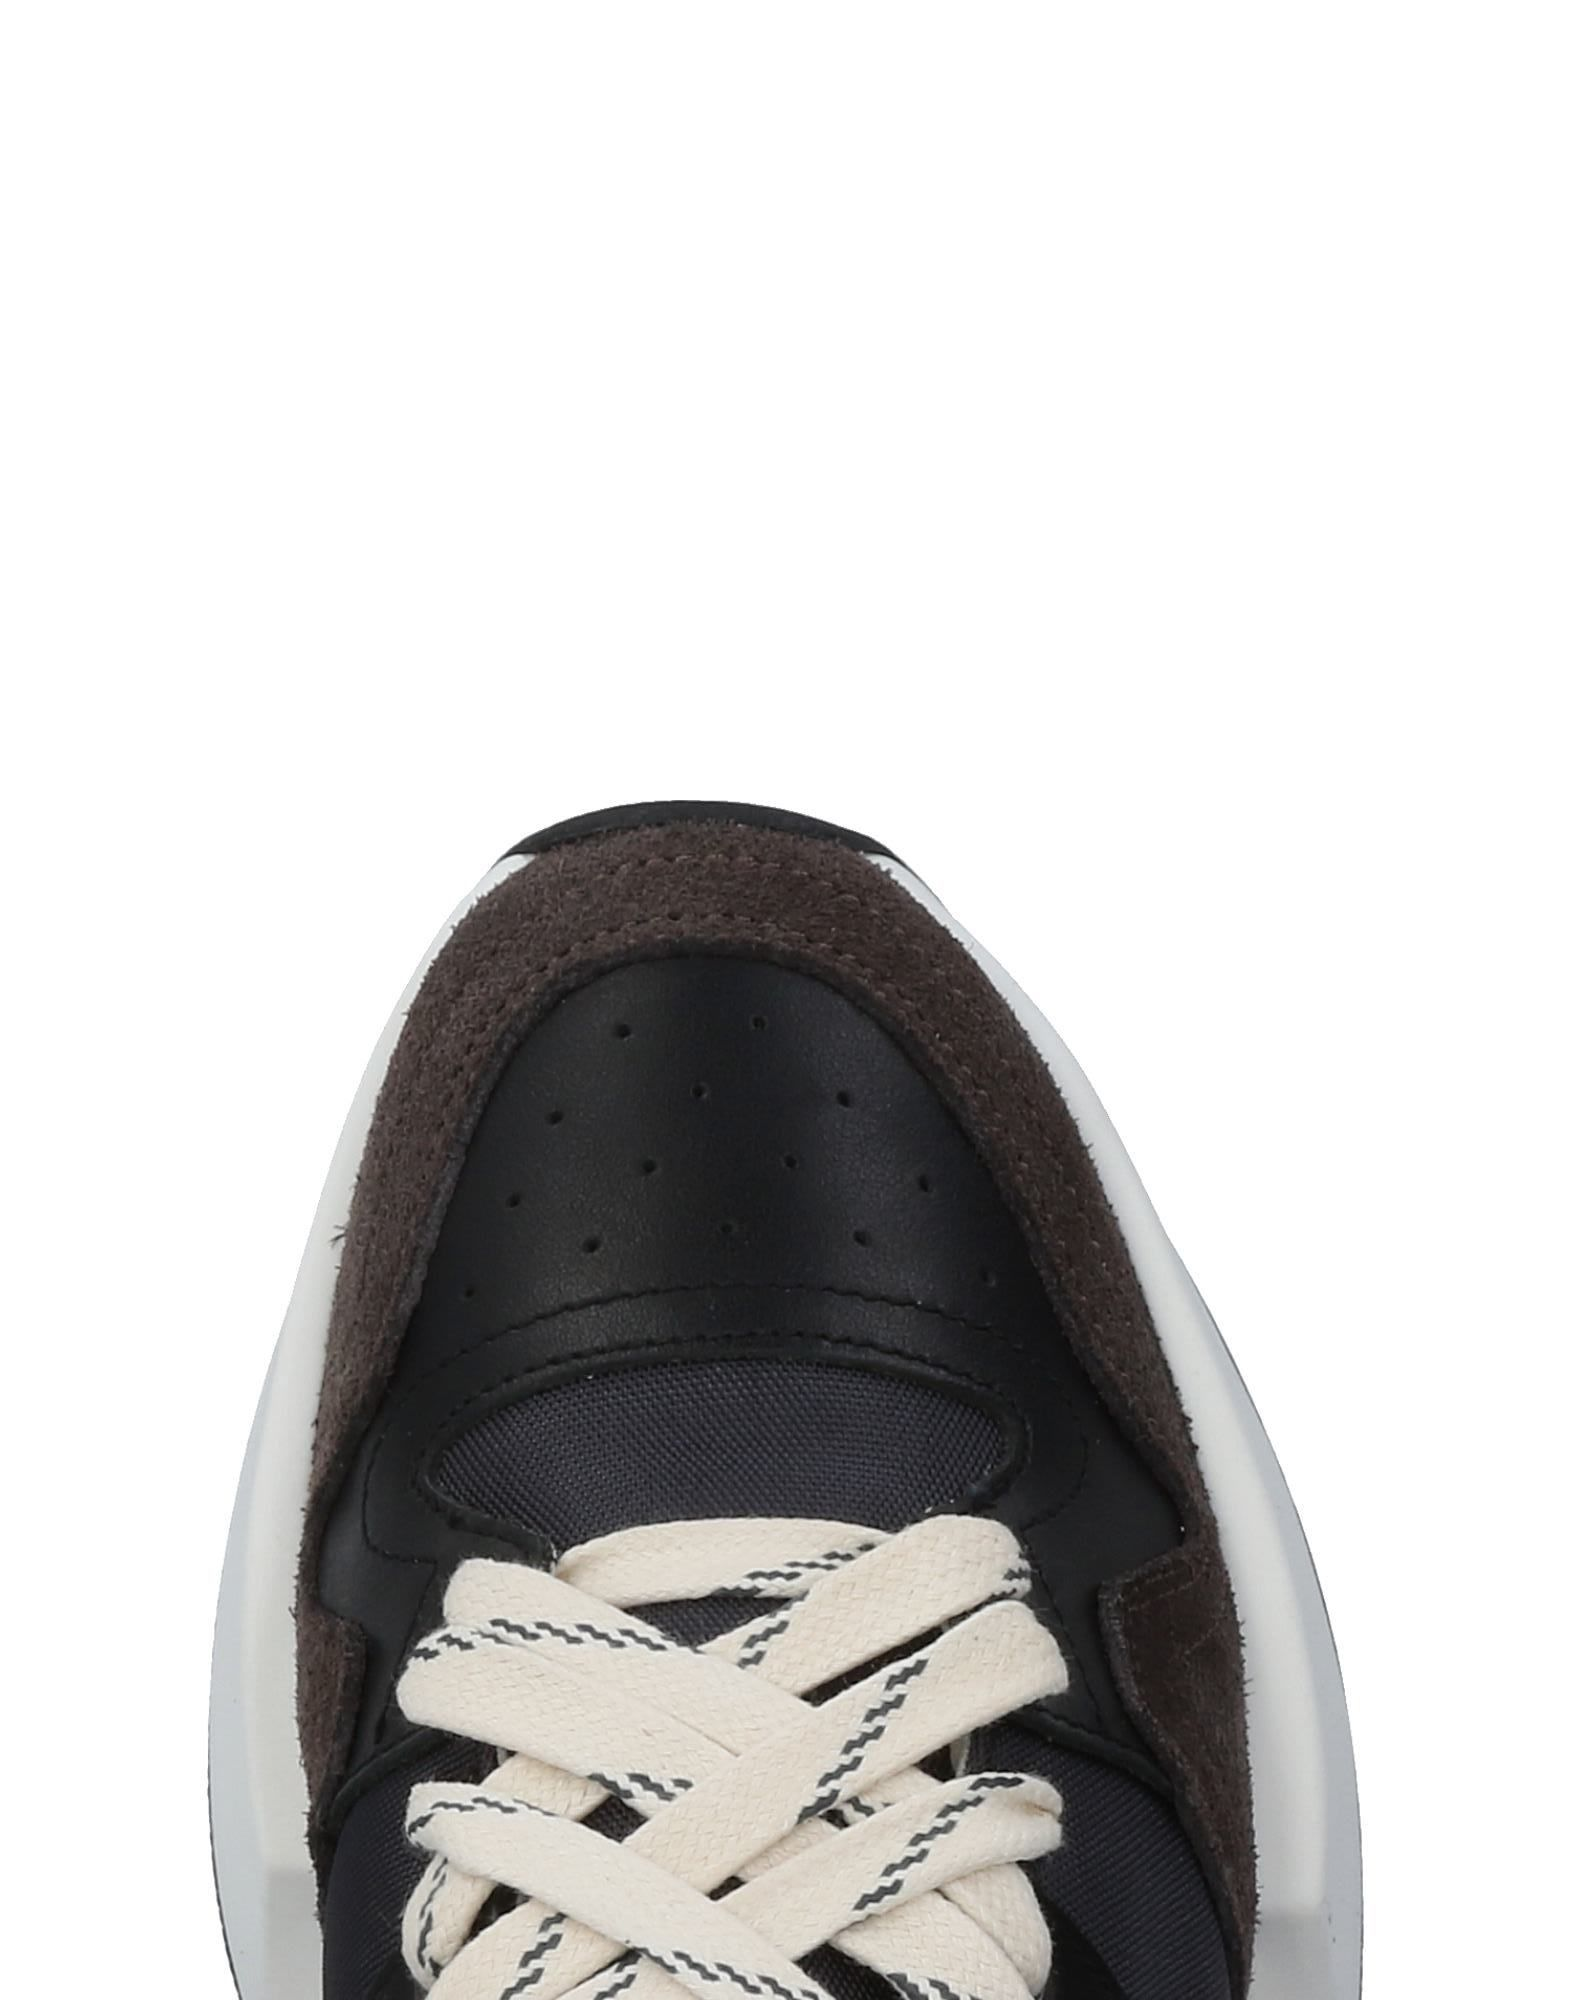 Mm6 Maison Margiela Sneakers Schuhe Damen  11469557LS Neue Schuhe Sneakers ac5c9a